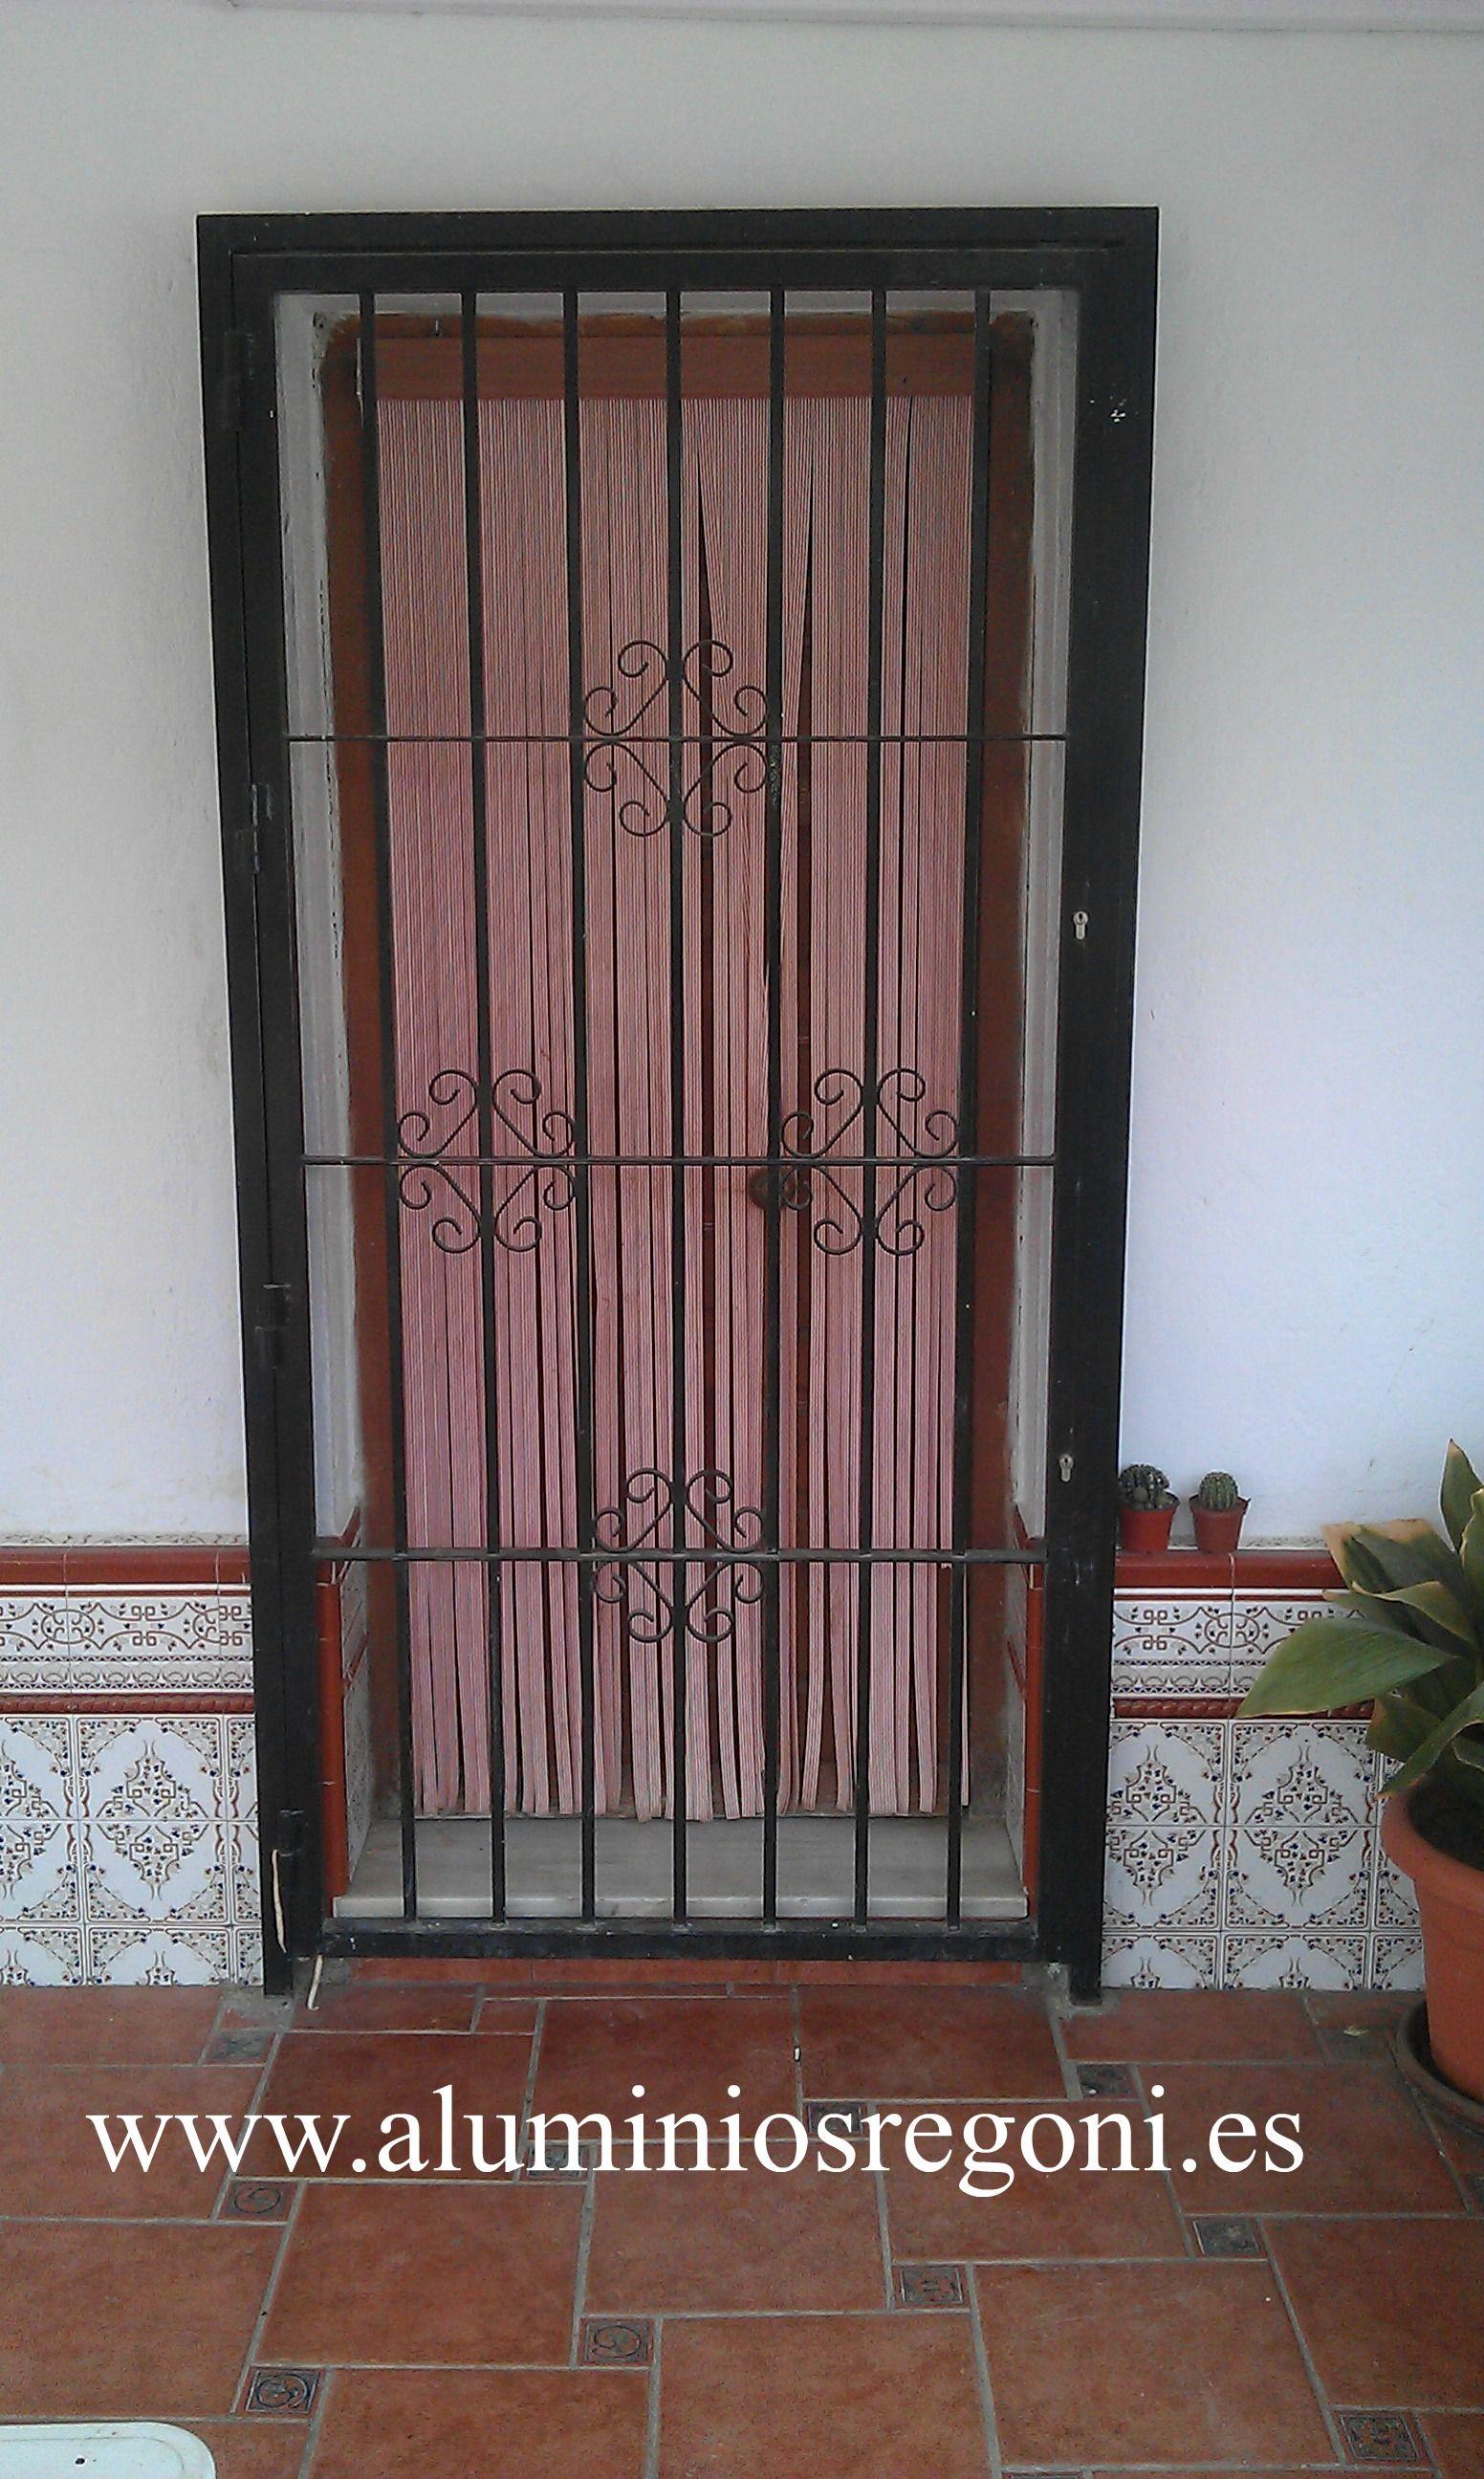 Puerta reja   Puertas de hierro   Pinterest   Puerta reja, Rejas y ...